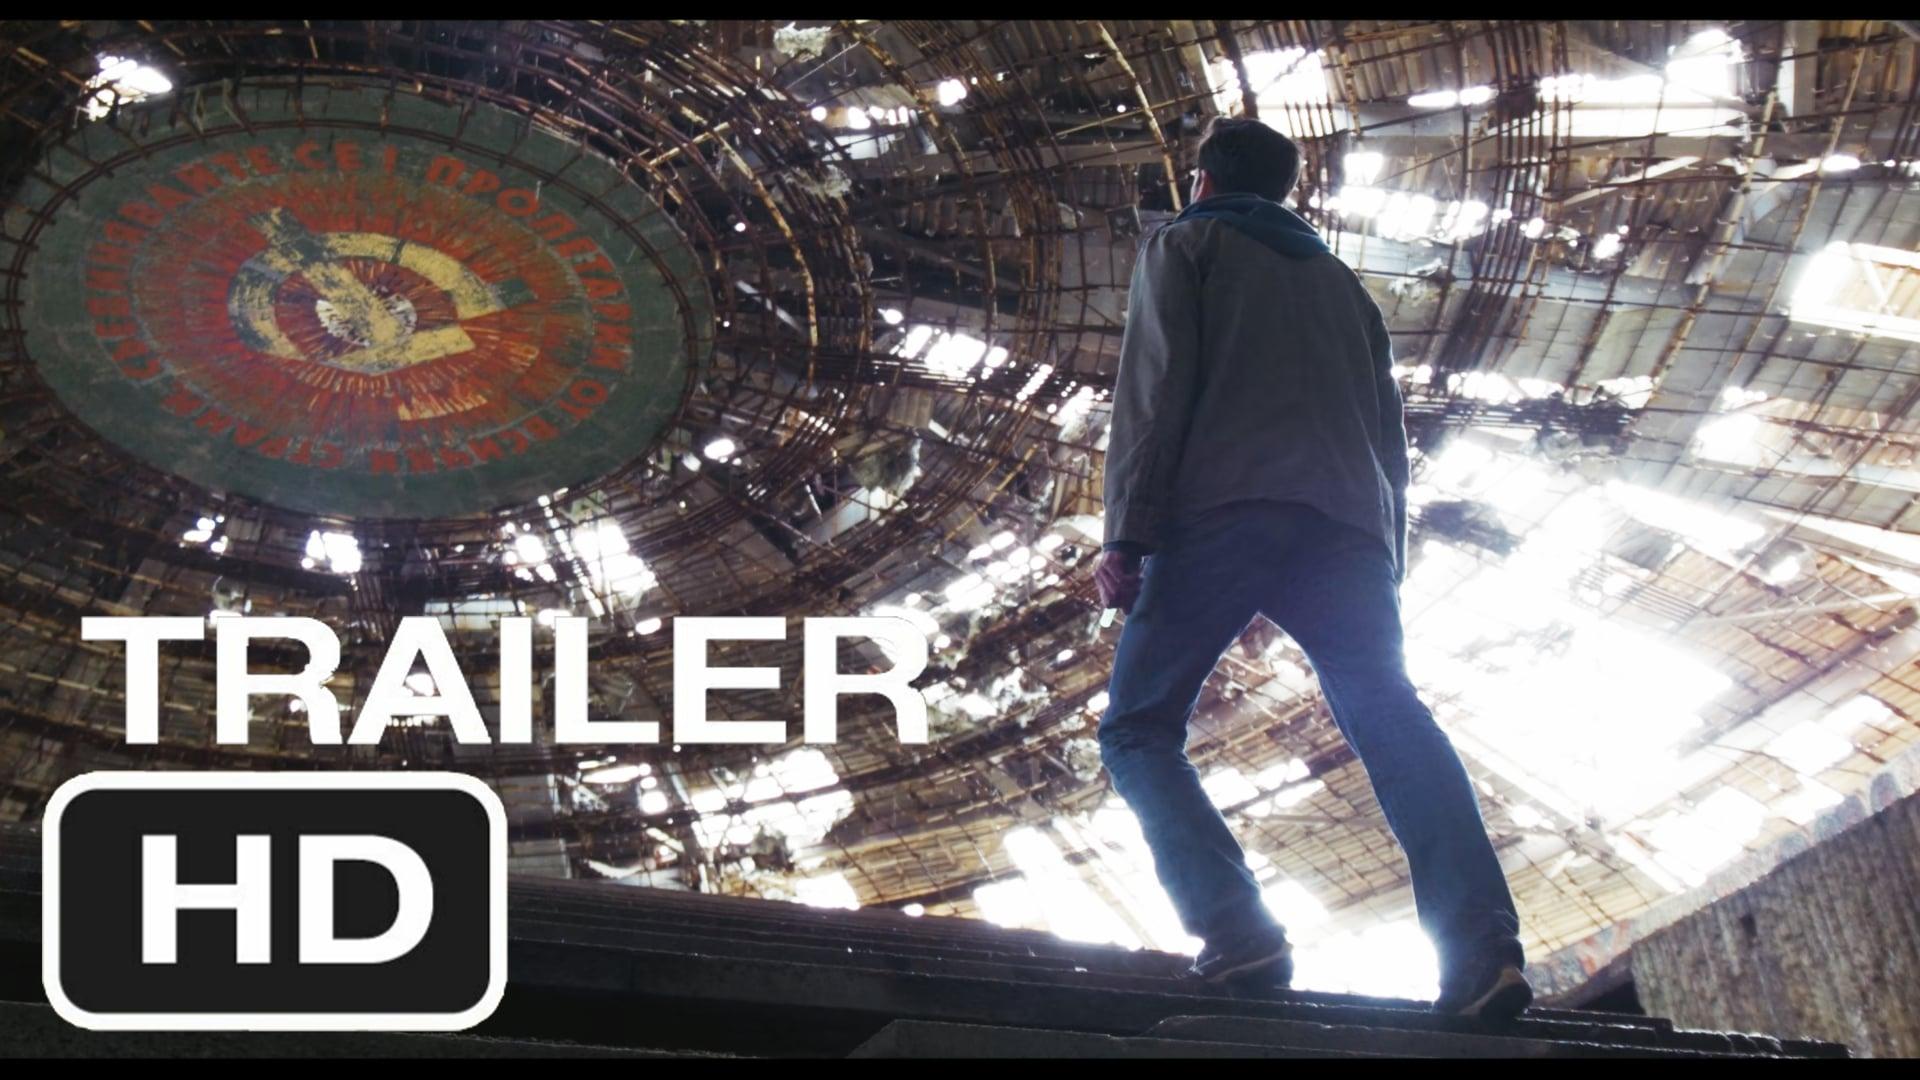 HERITAGE Official Trailer (2019) - Jake Koeppl, Bettina Zimmermann, Peter Lohmeyer